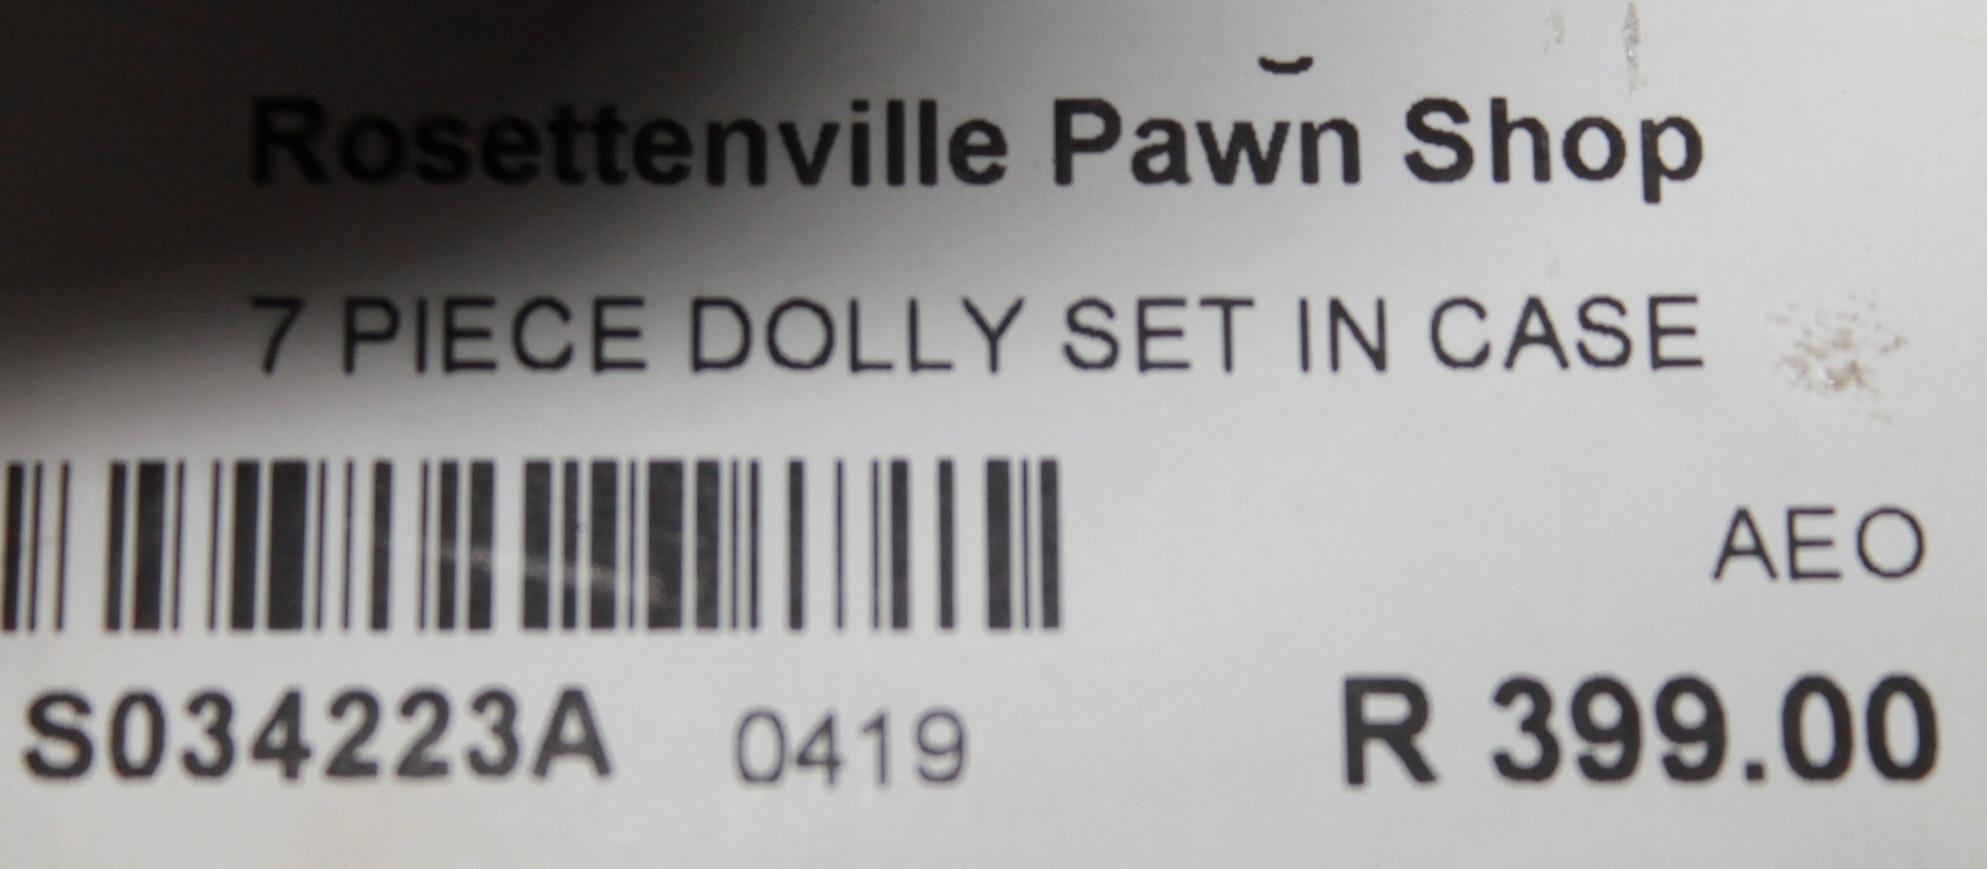 S034223A 7 Piece dolly set in case #Rosettenvillepawnshop